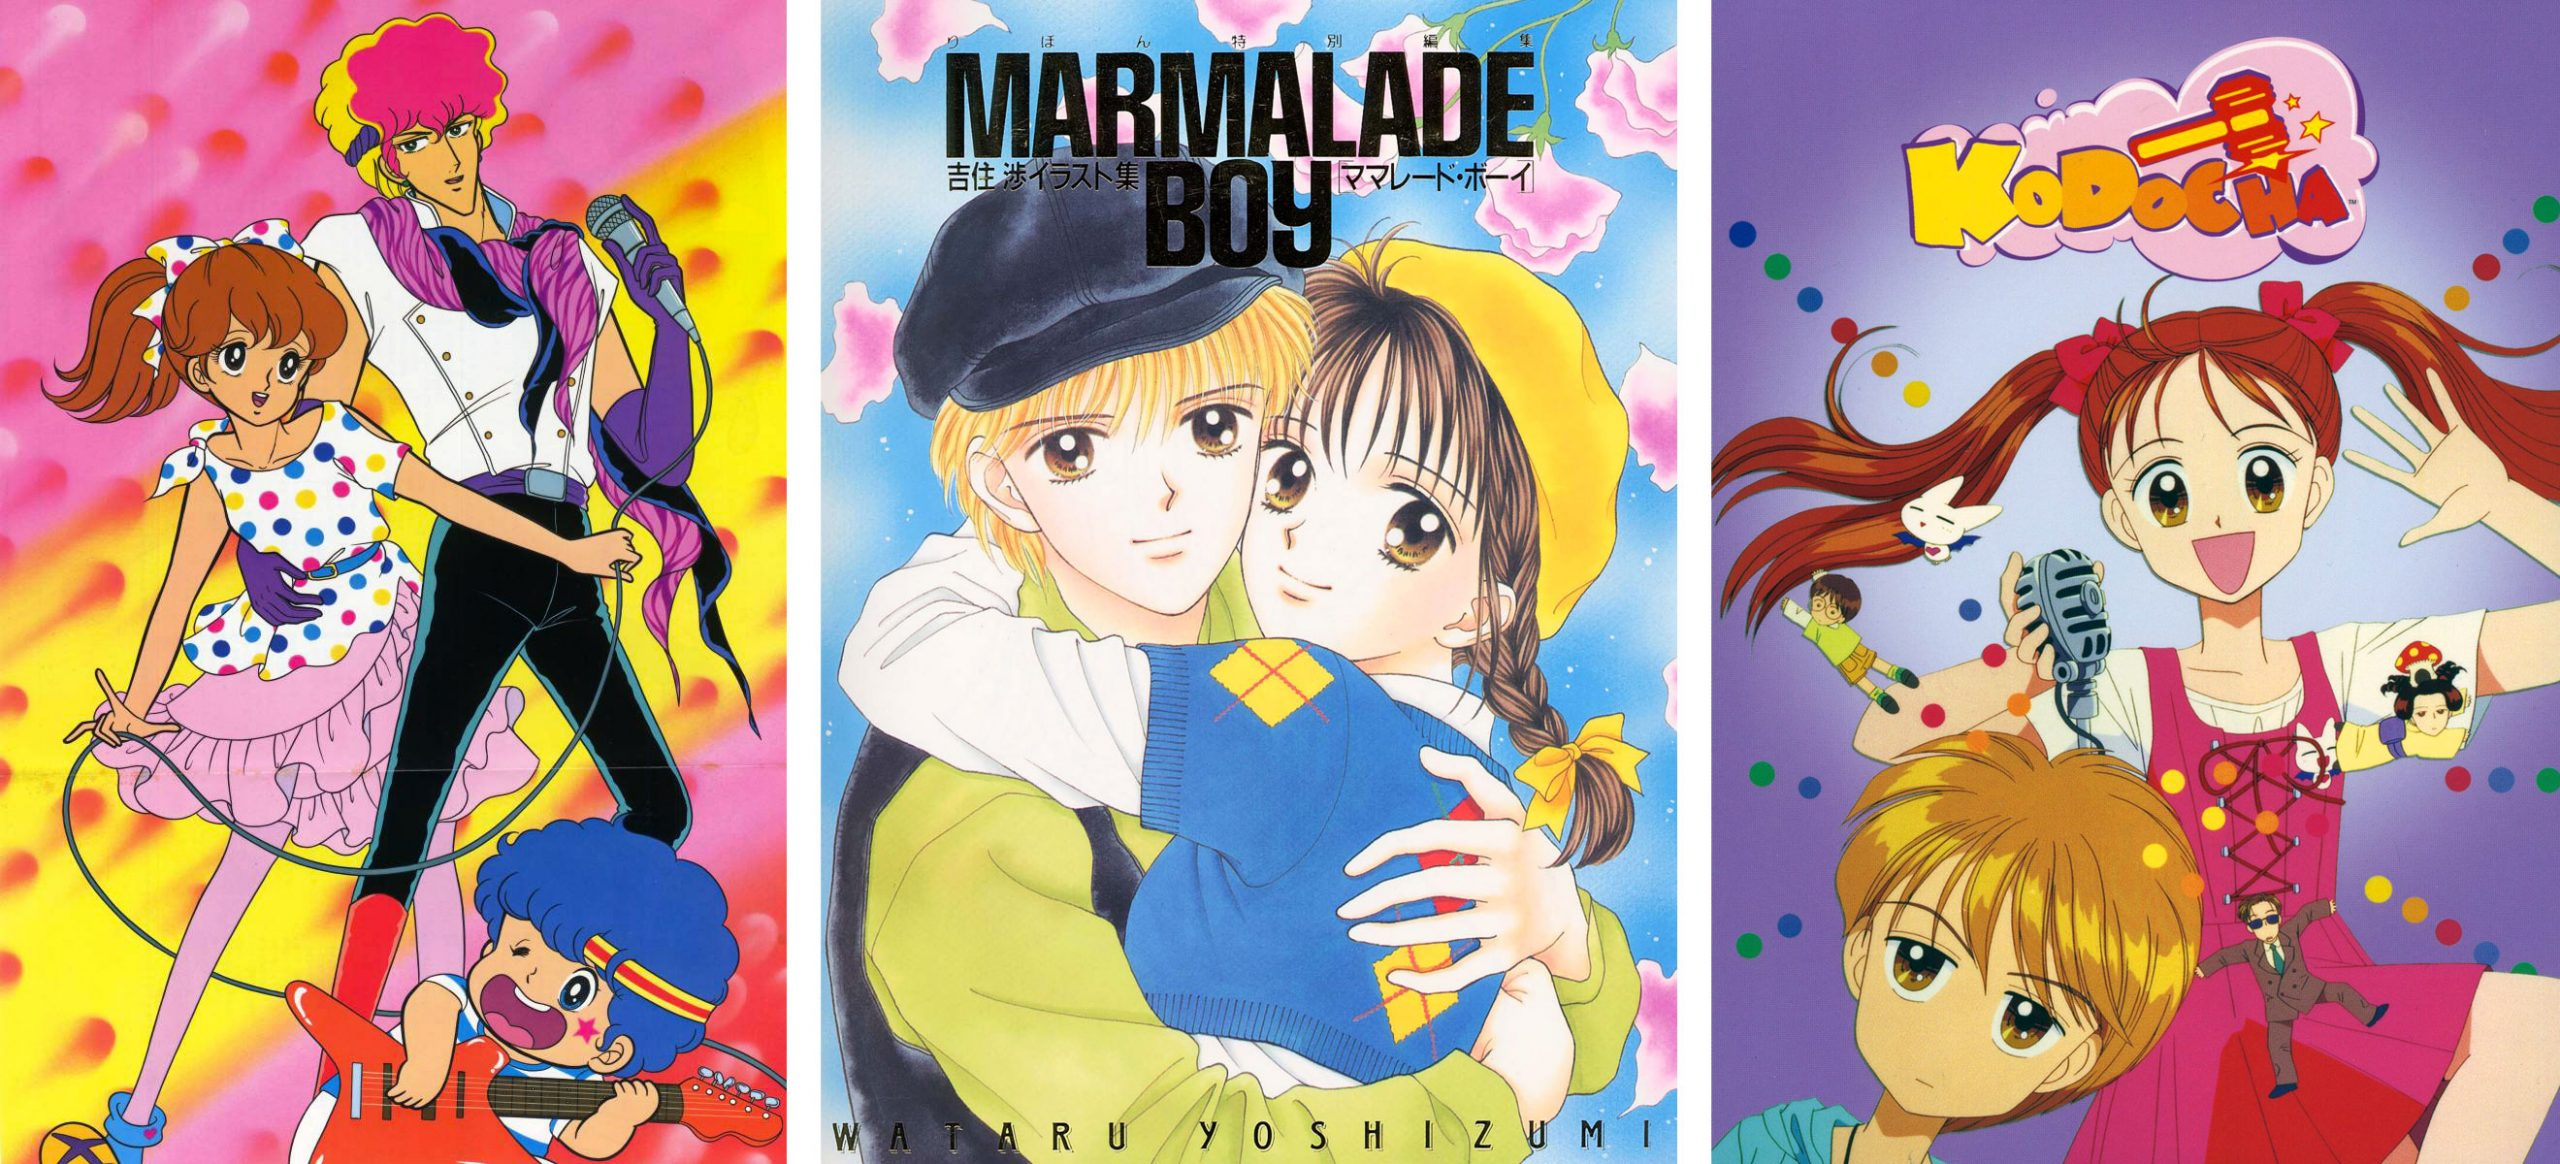 Love me Knight, Marmelade Boy, Kodomo no Omocha